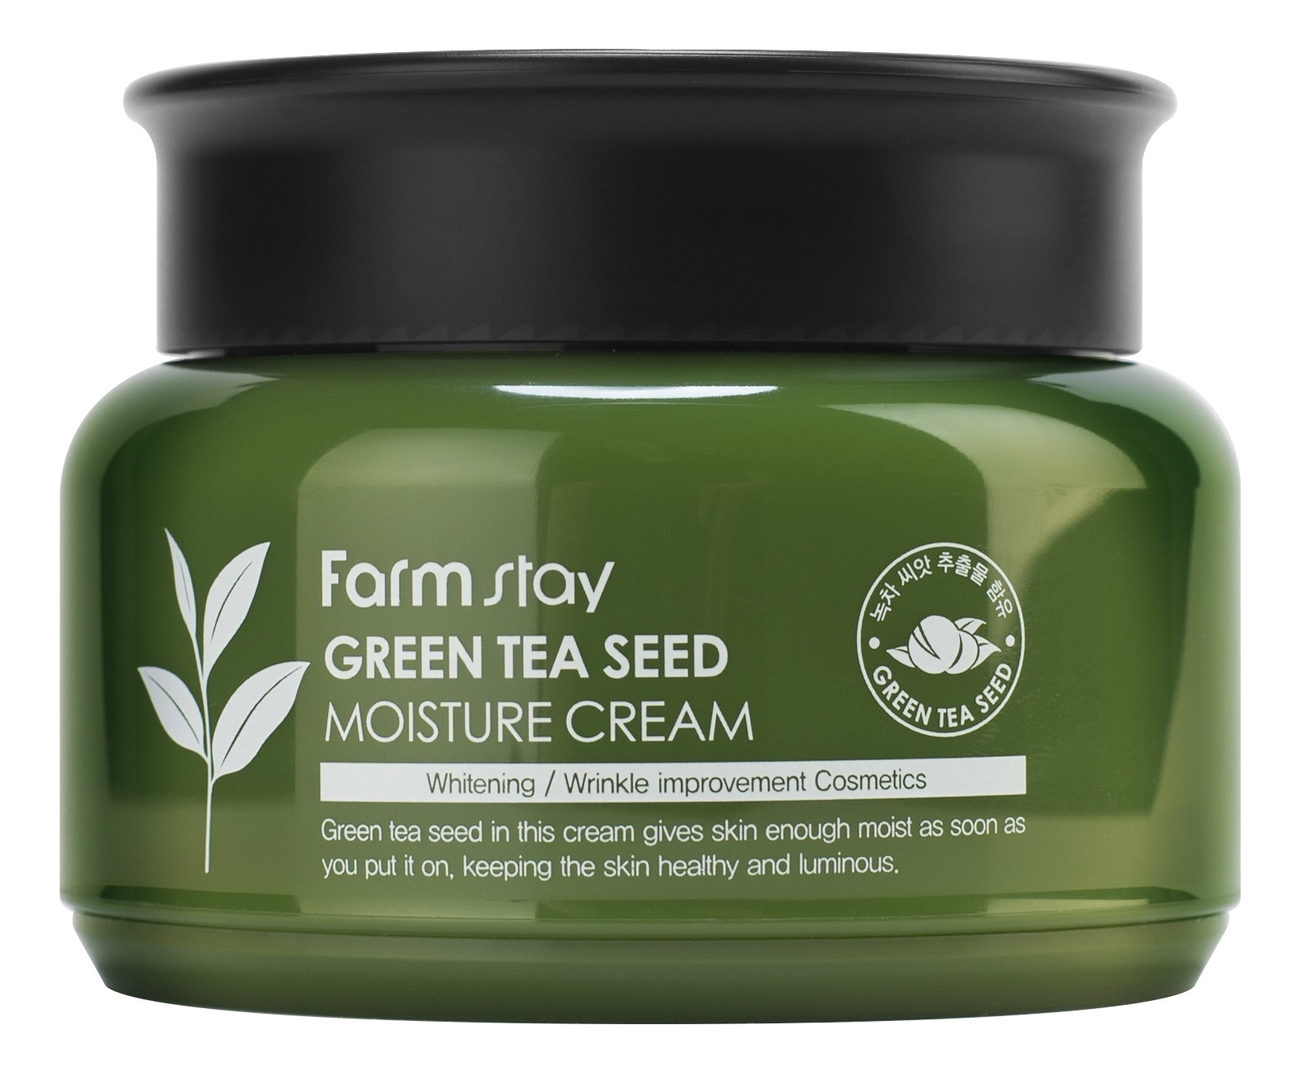 Увлажняющий крем для лица Green Tea Seed Moisture Cream 100мл chi luxury black seed oil curl defining cream gel